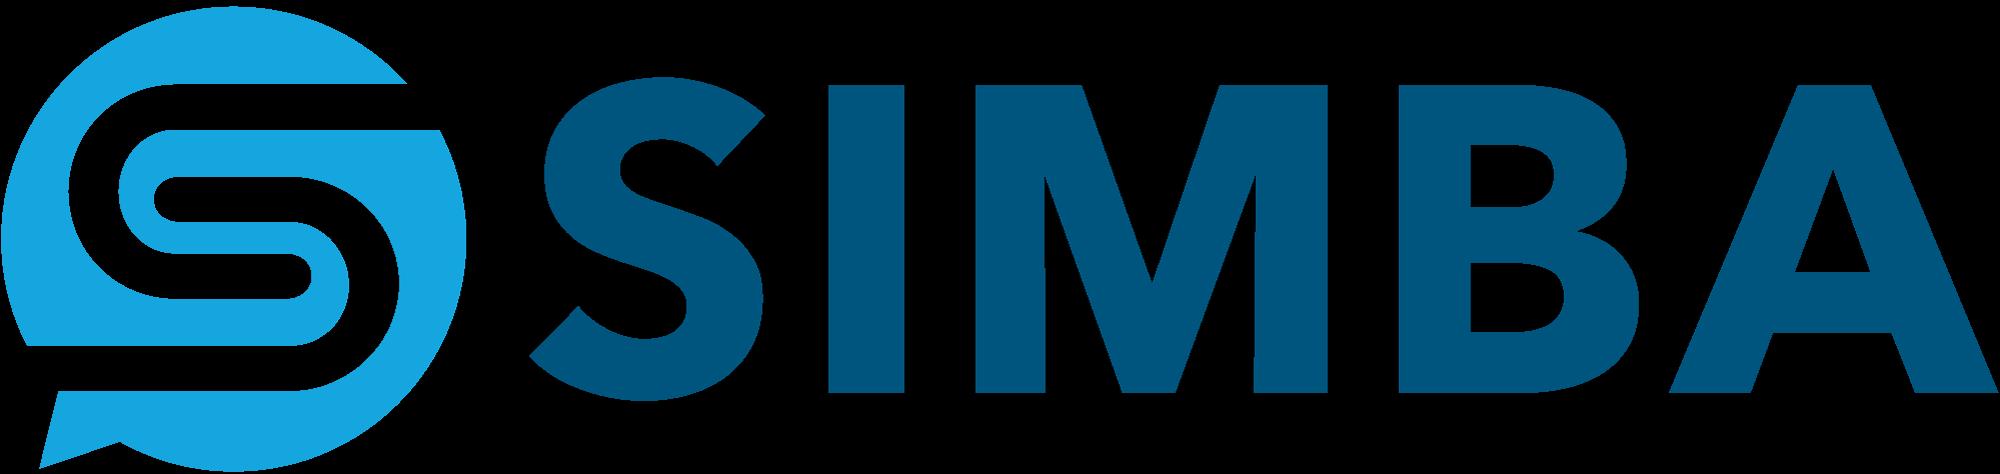 SIMBA_logo h2